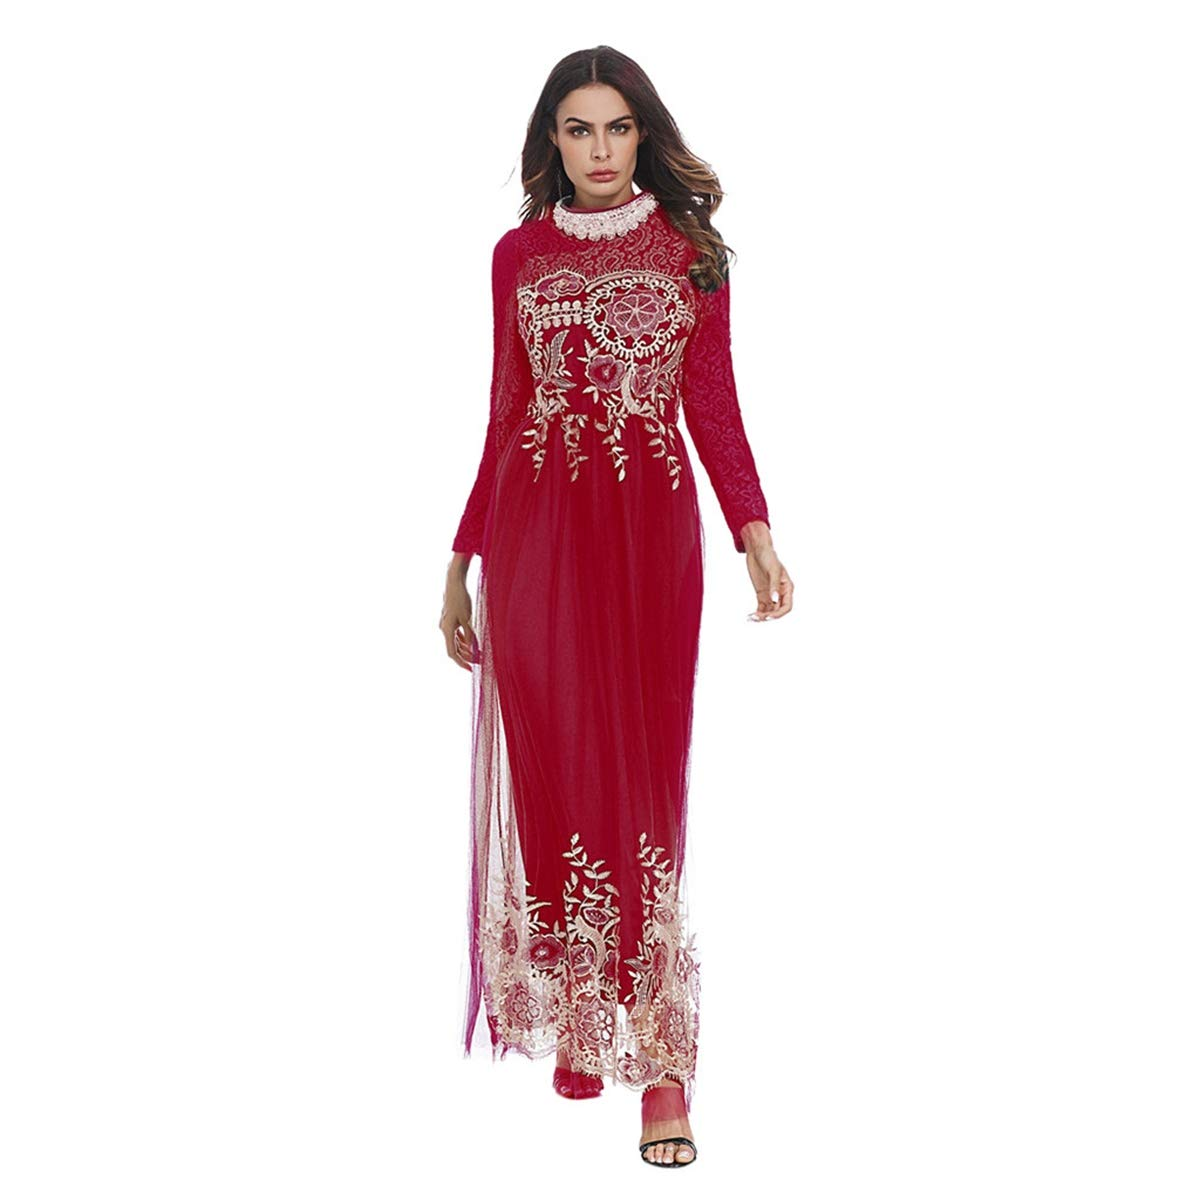 7556ed8b8cb Amazon.com  2019 Hot! Women Muslim Dress